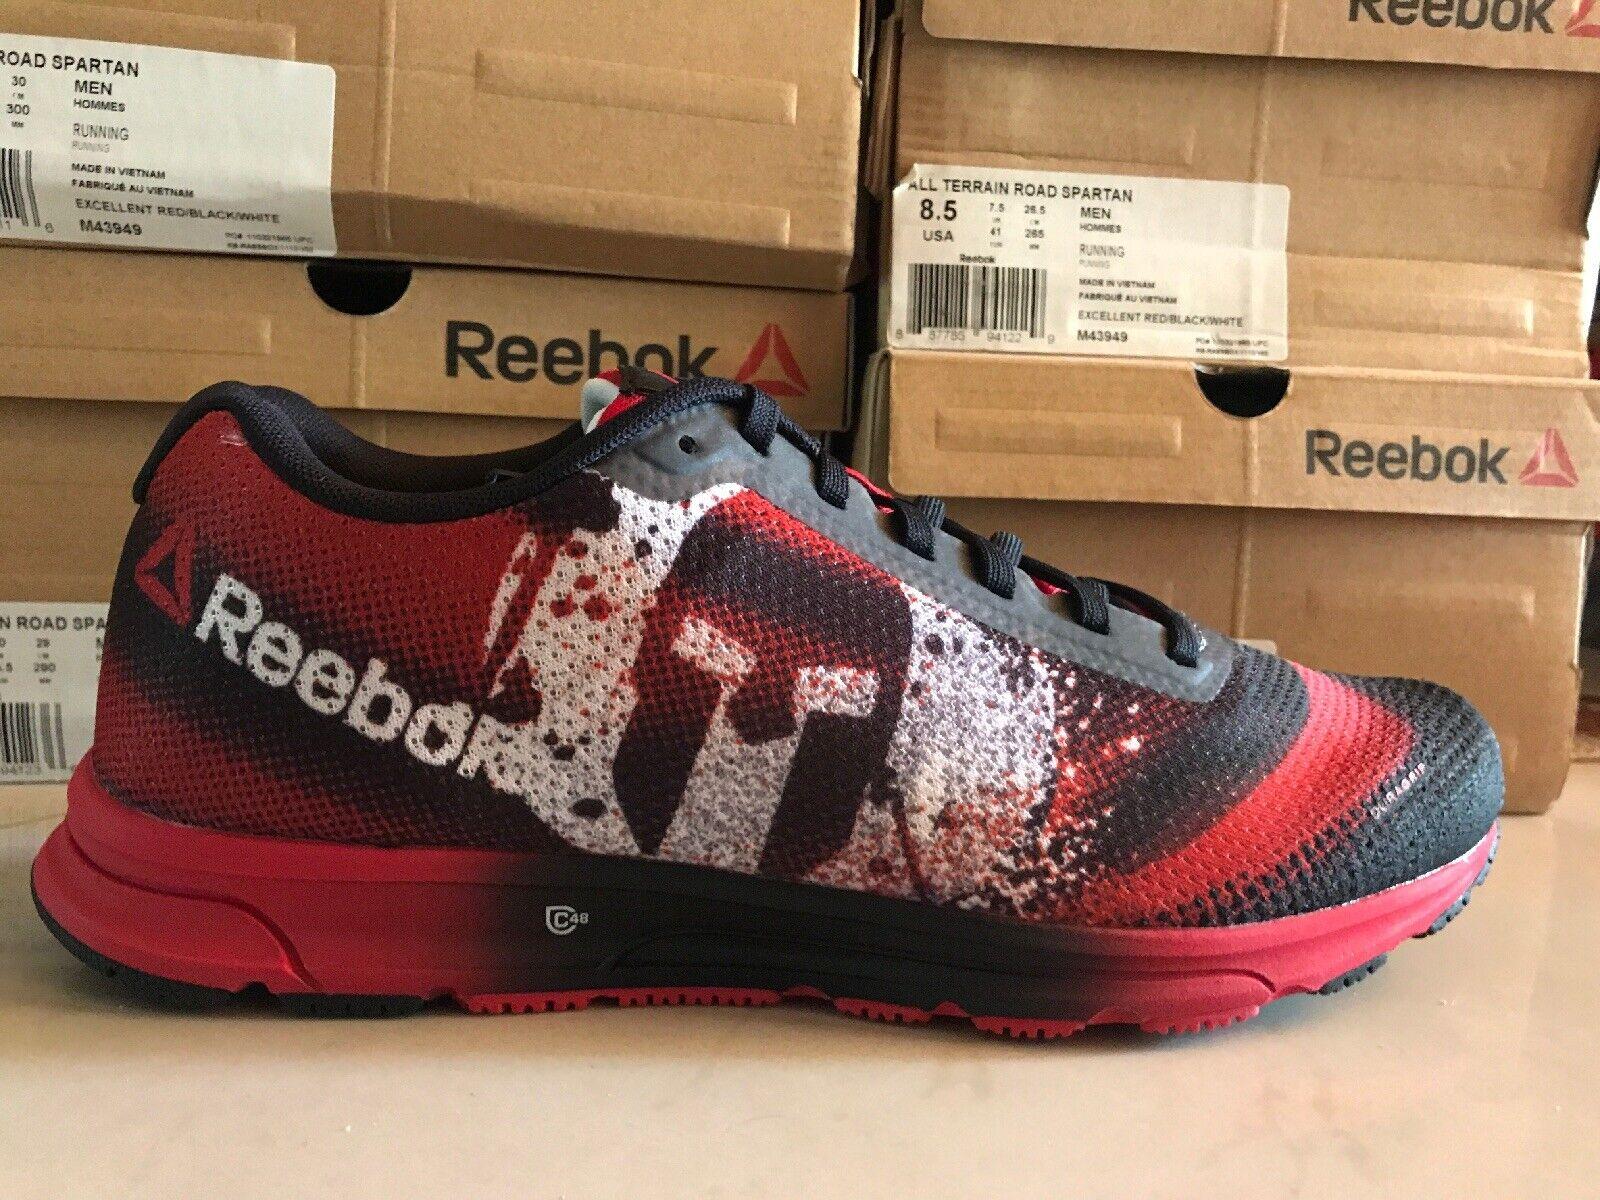 Reebok All Terrain Spartan Race model running shoes men size 10 Red Black